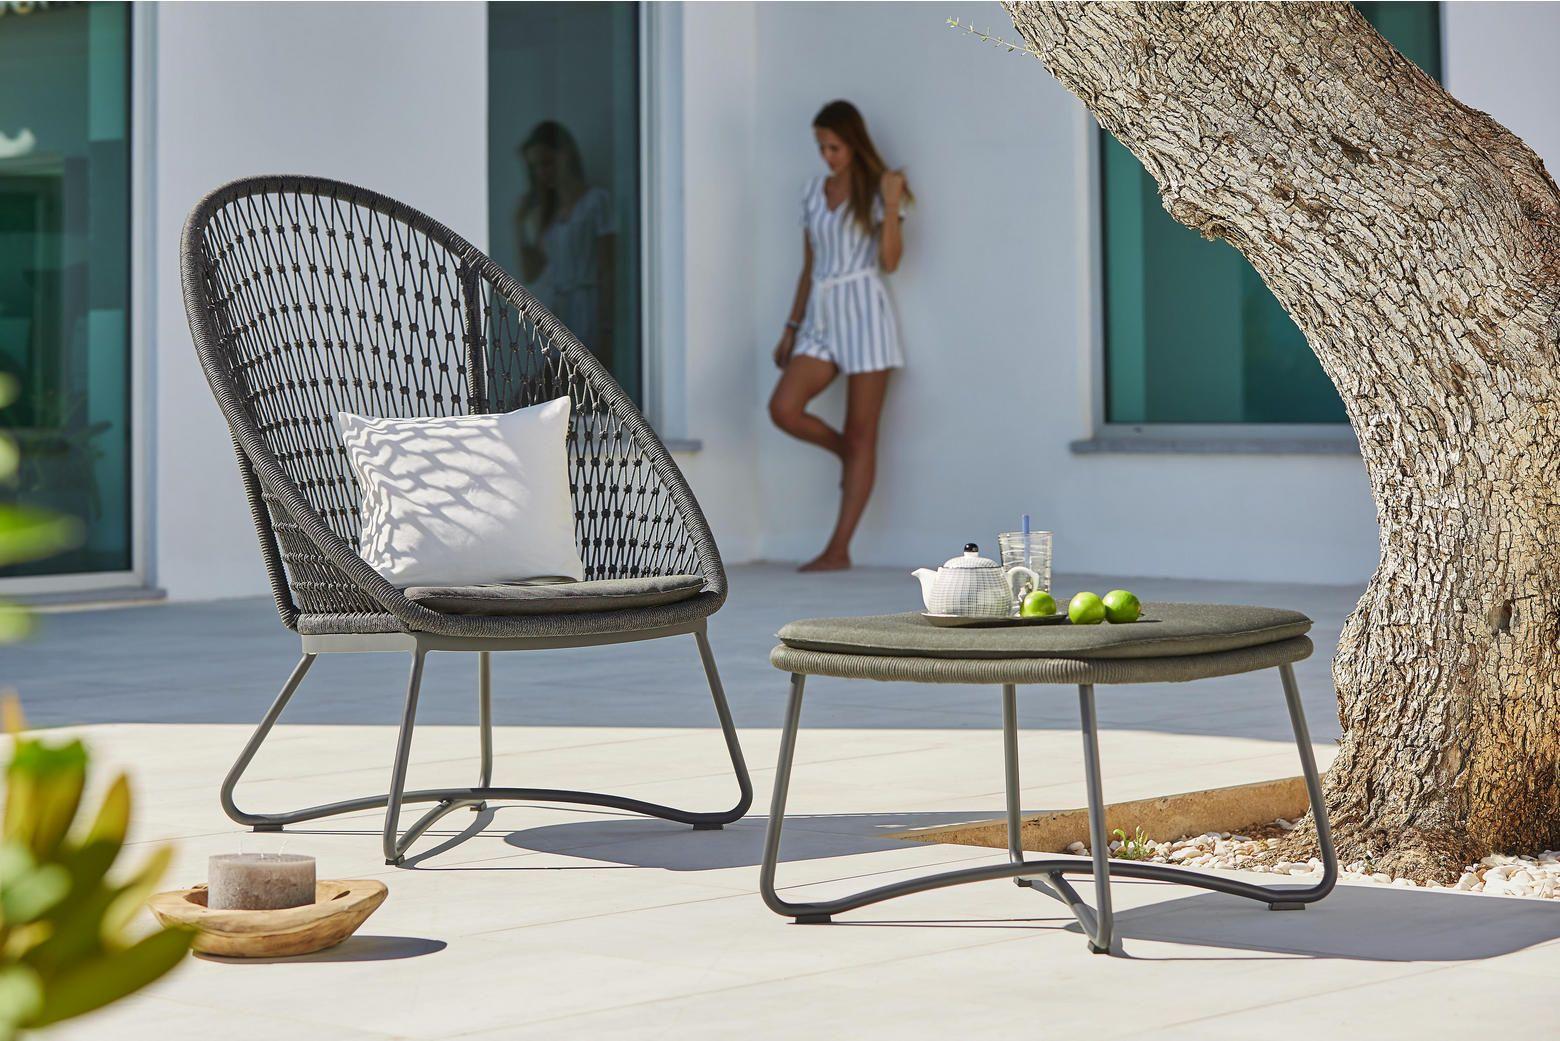 Garten Relaxsessel In Grau Olefinfaser Geflochten Relaxsessel Relaxen Sessel